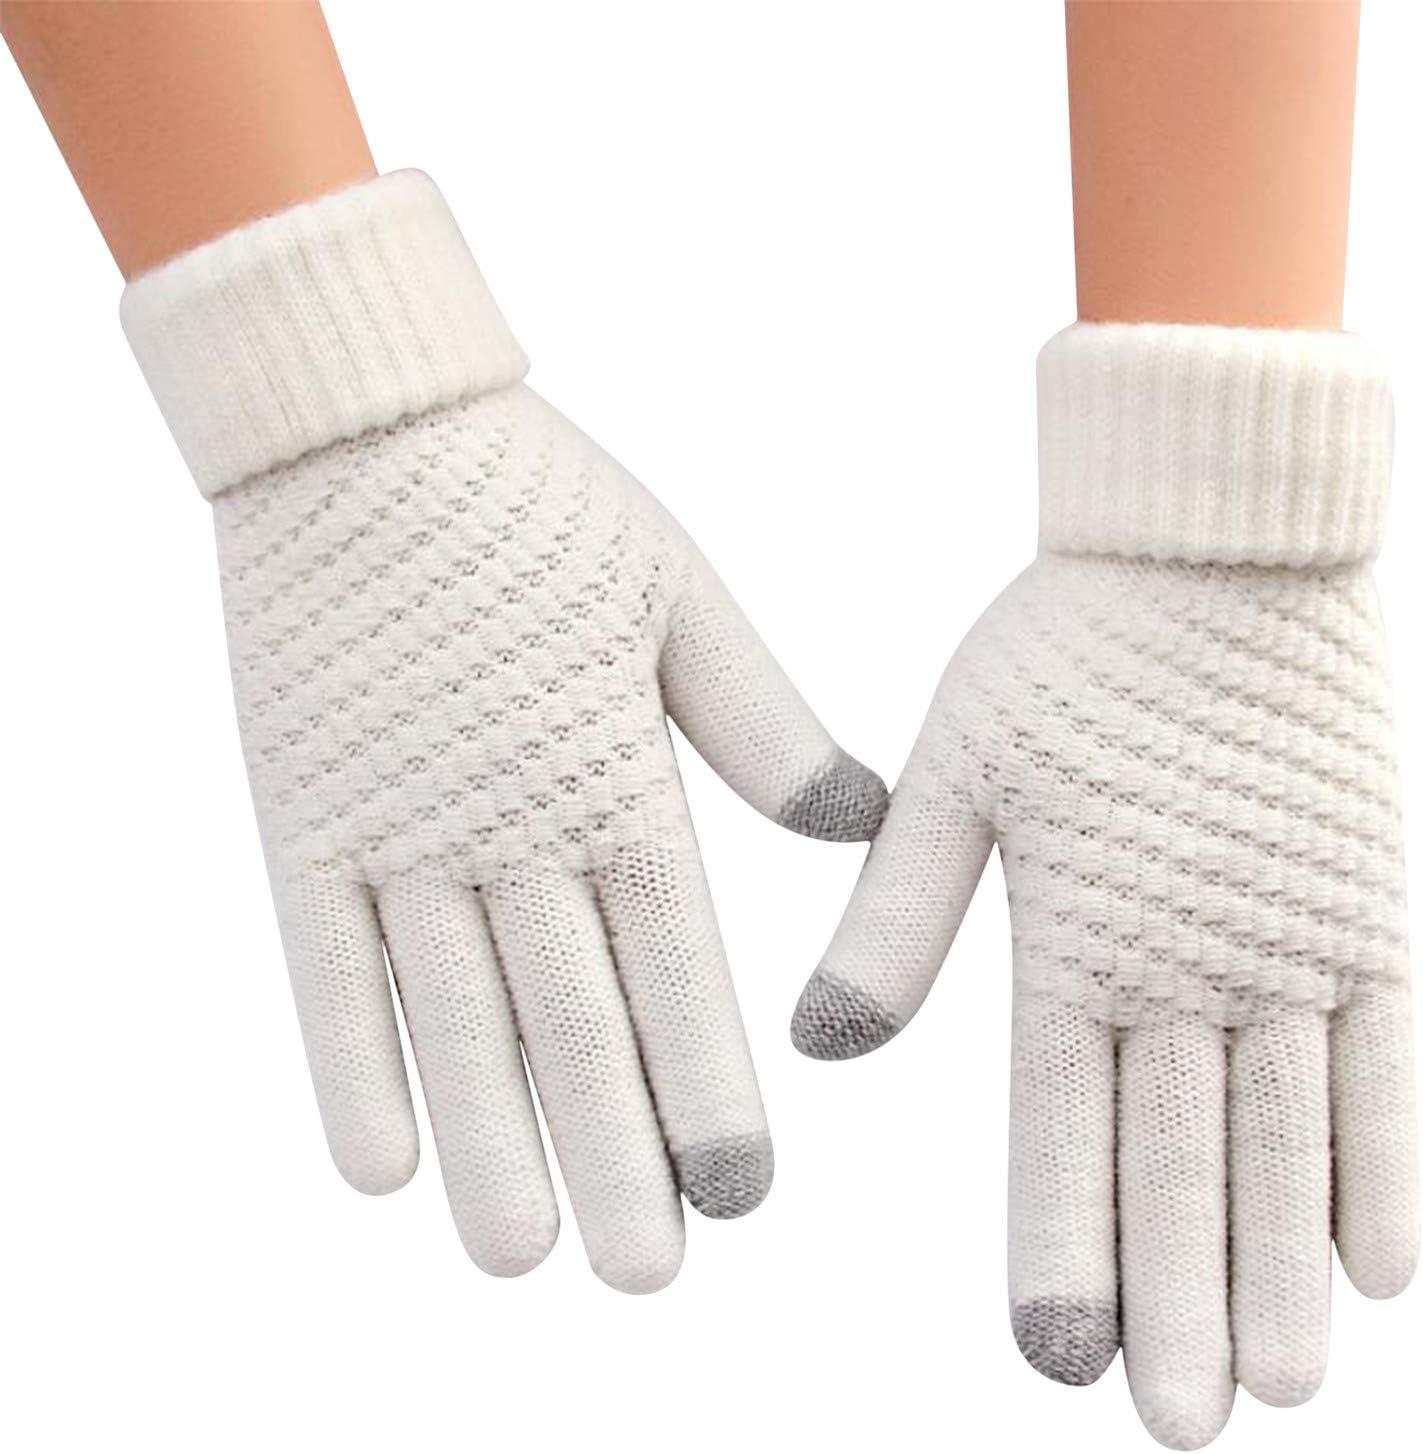 WEILYDF Women's Gloves Five-Finger Pineapple Pattern Winter Touch Thickened Warmth Velvet Knitted Soft Mittens Outdoor Accessories,White